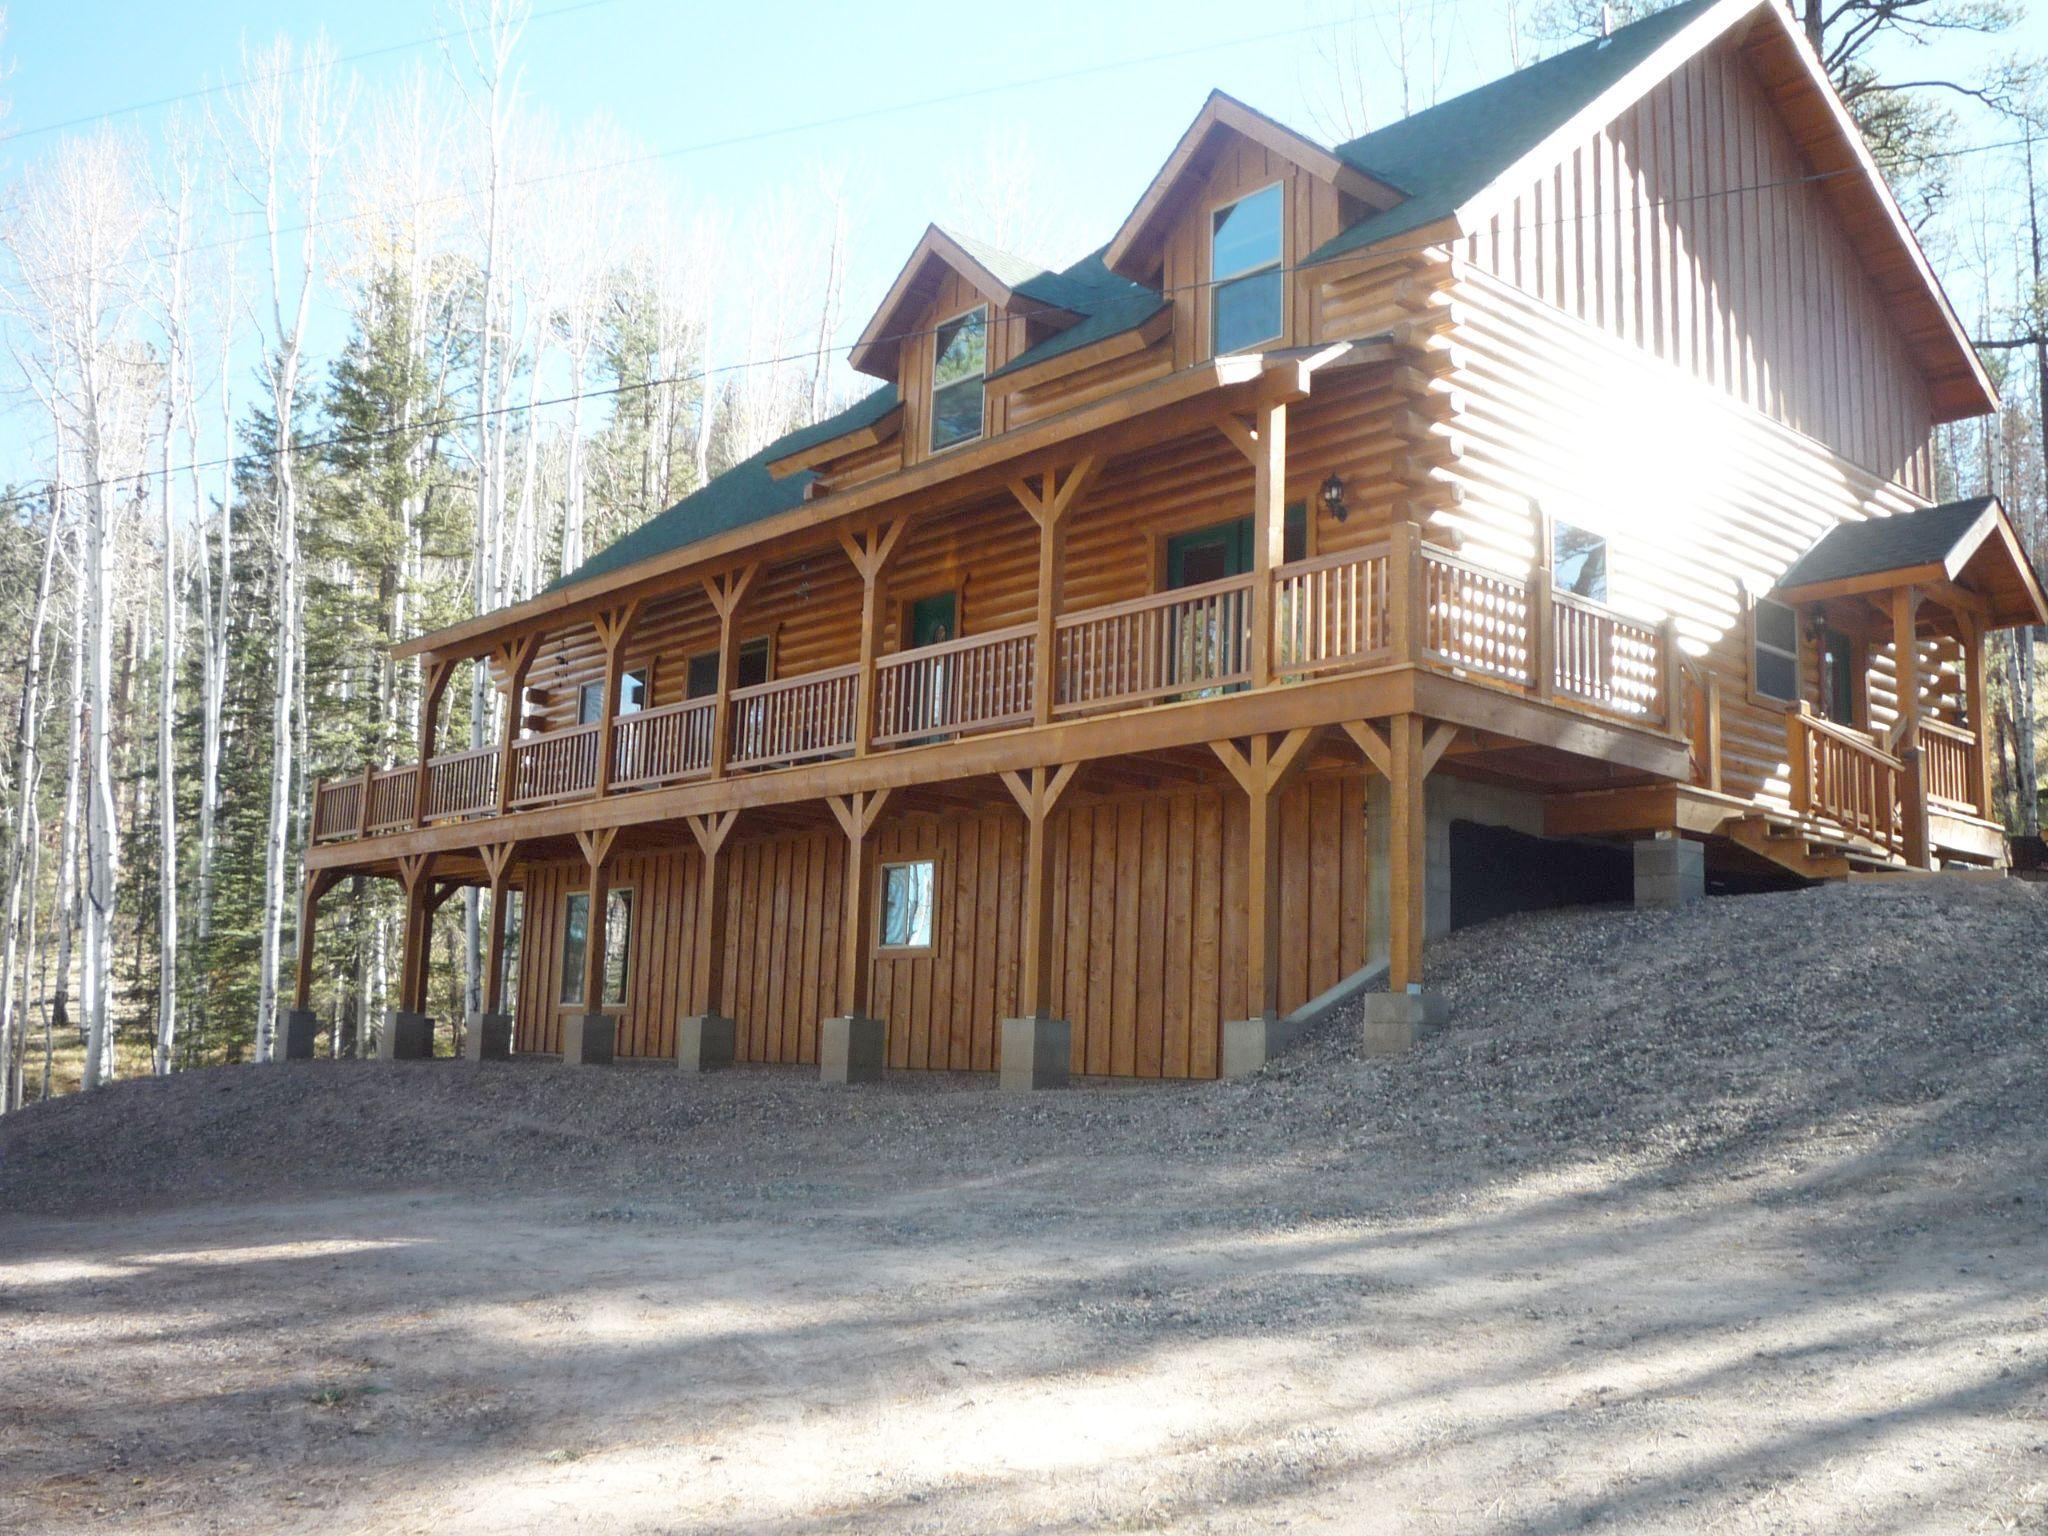 Hokita Lodge Cabin at the Molly Butler Lodge in Greer AZ